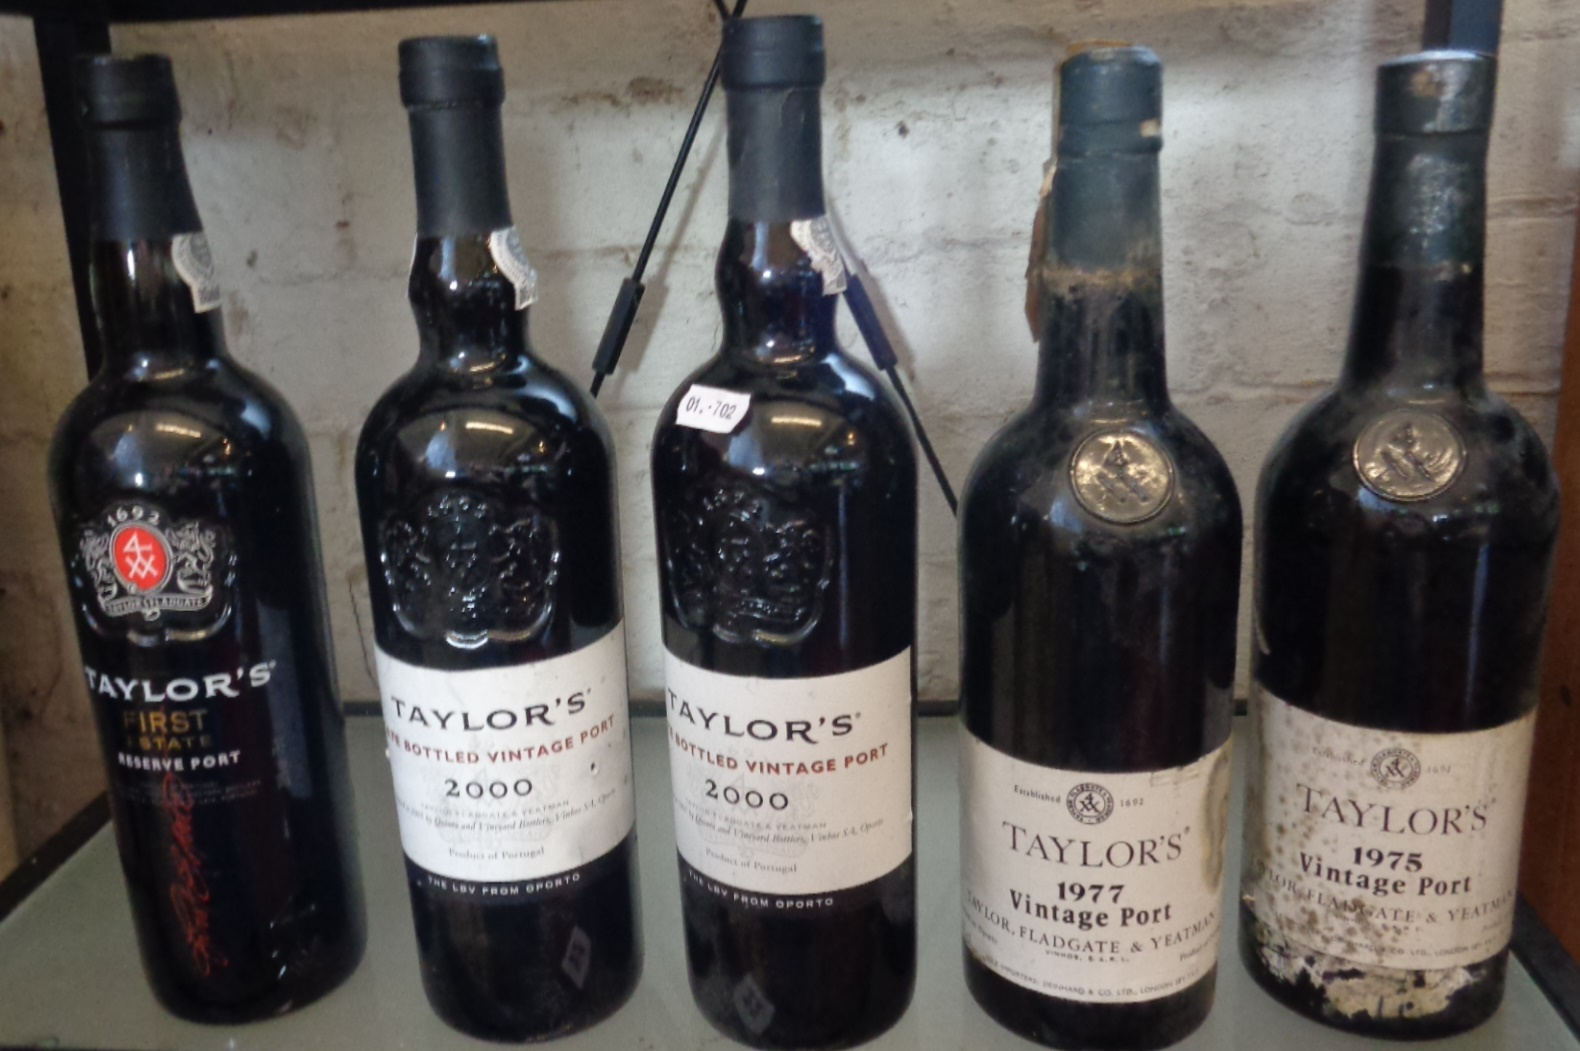 Lot 22 - Five bottles of Taylor's vintage port - First Estate Reserve, 2000 x 2, 1977 and 1975